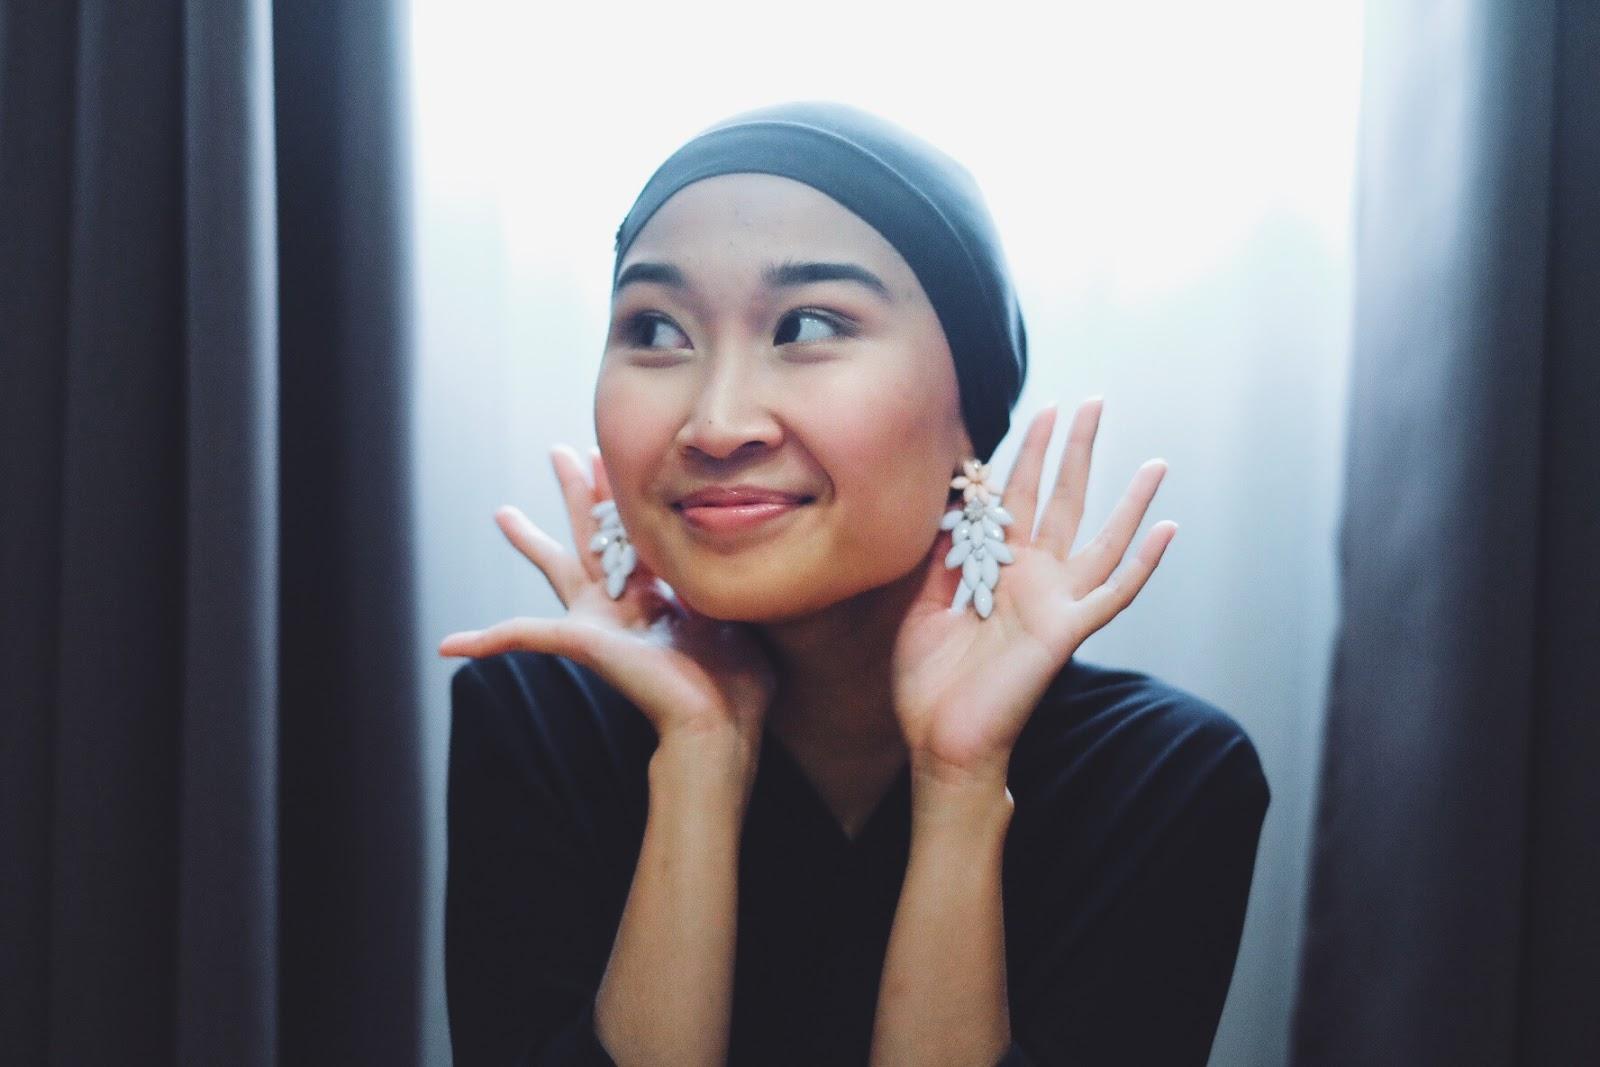 How I Style Hijab With Earrings Lipstickmyname